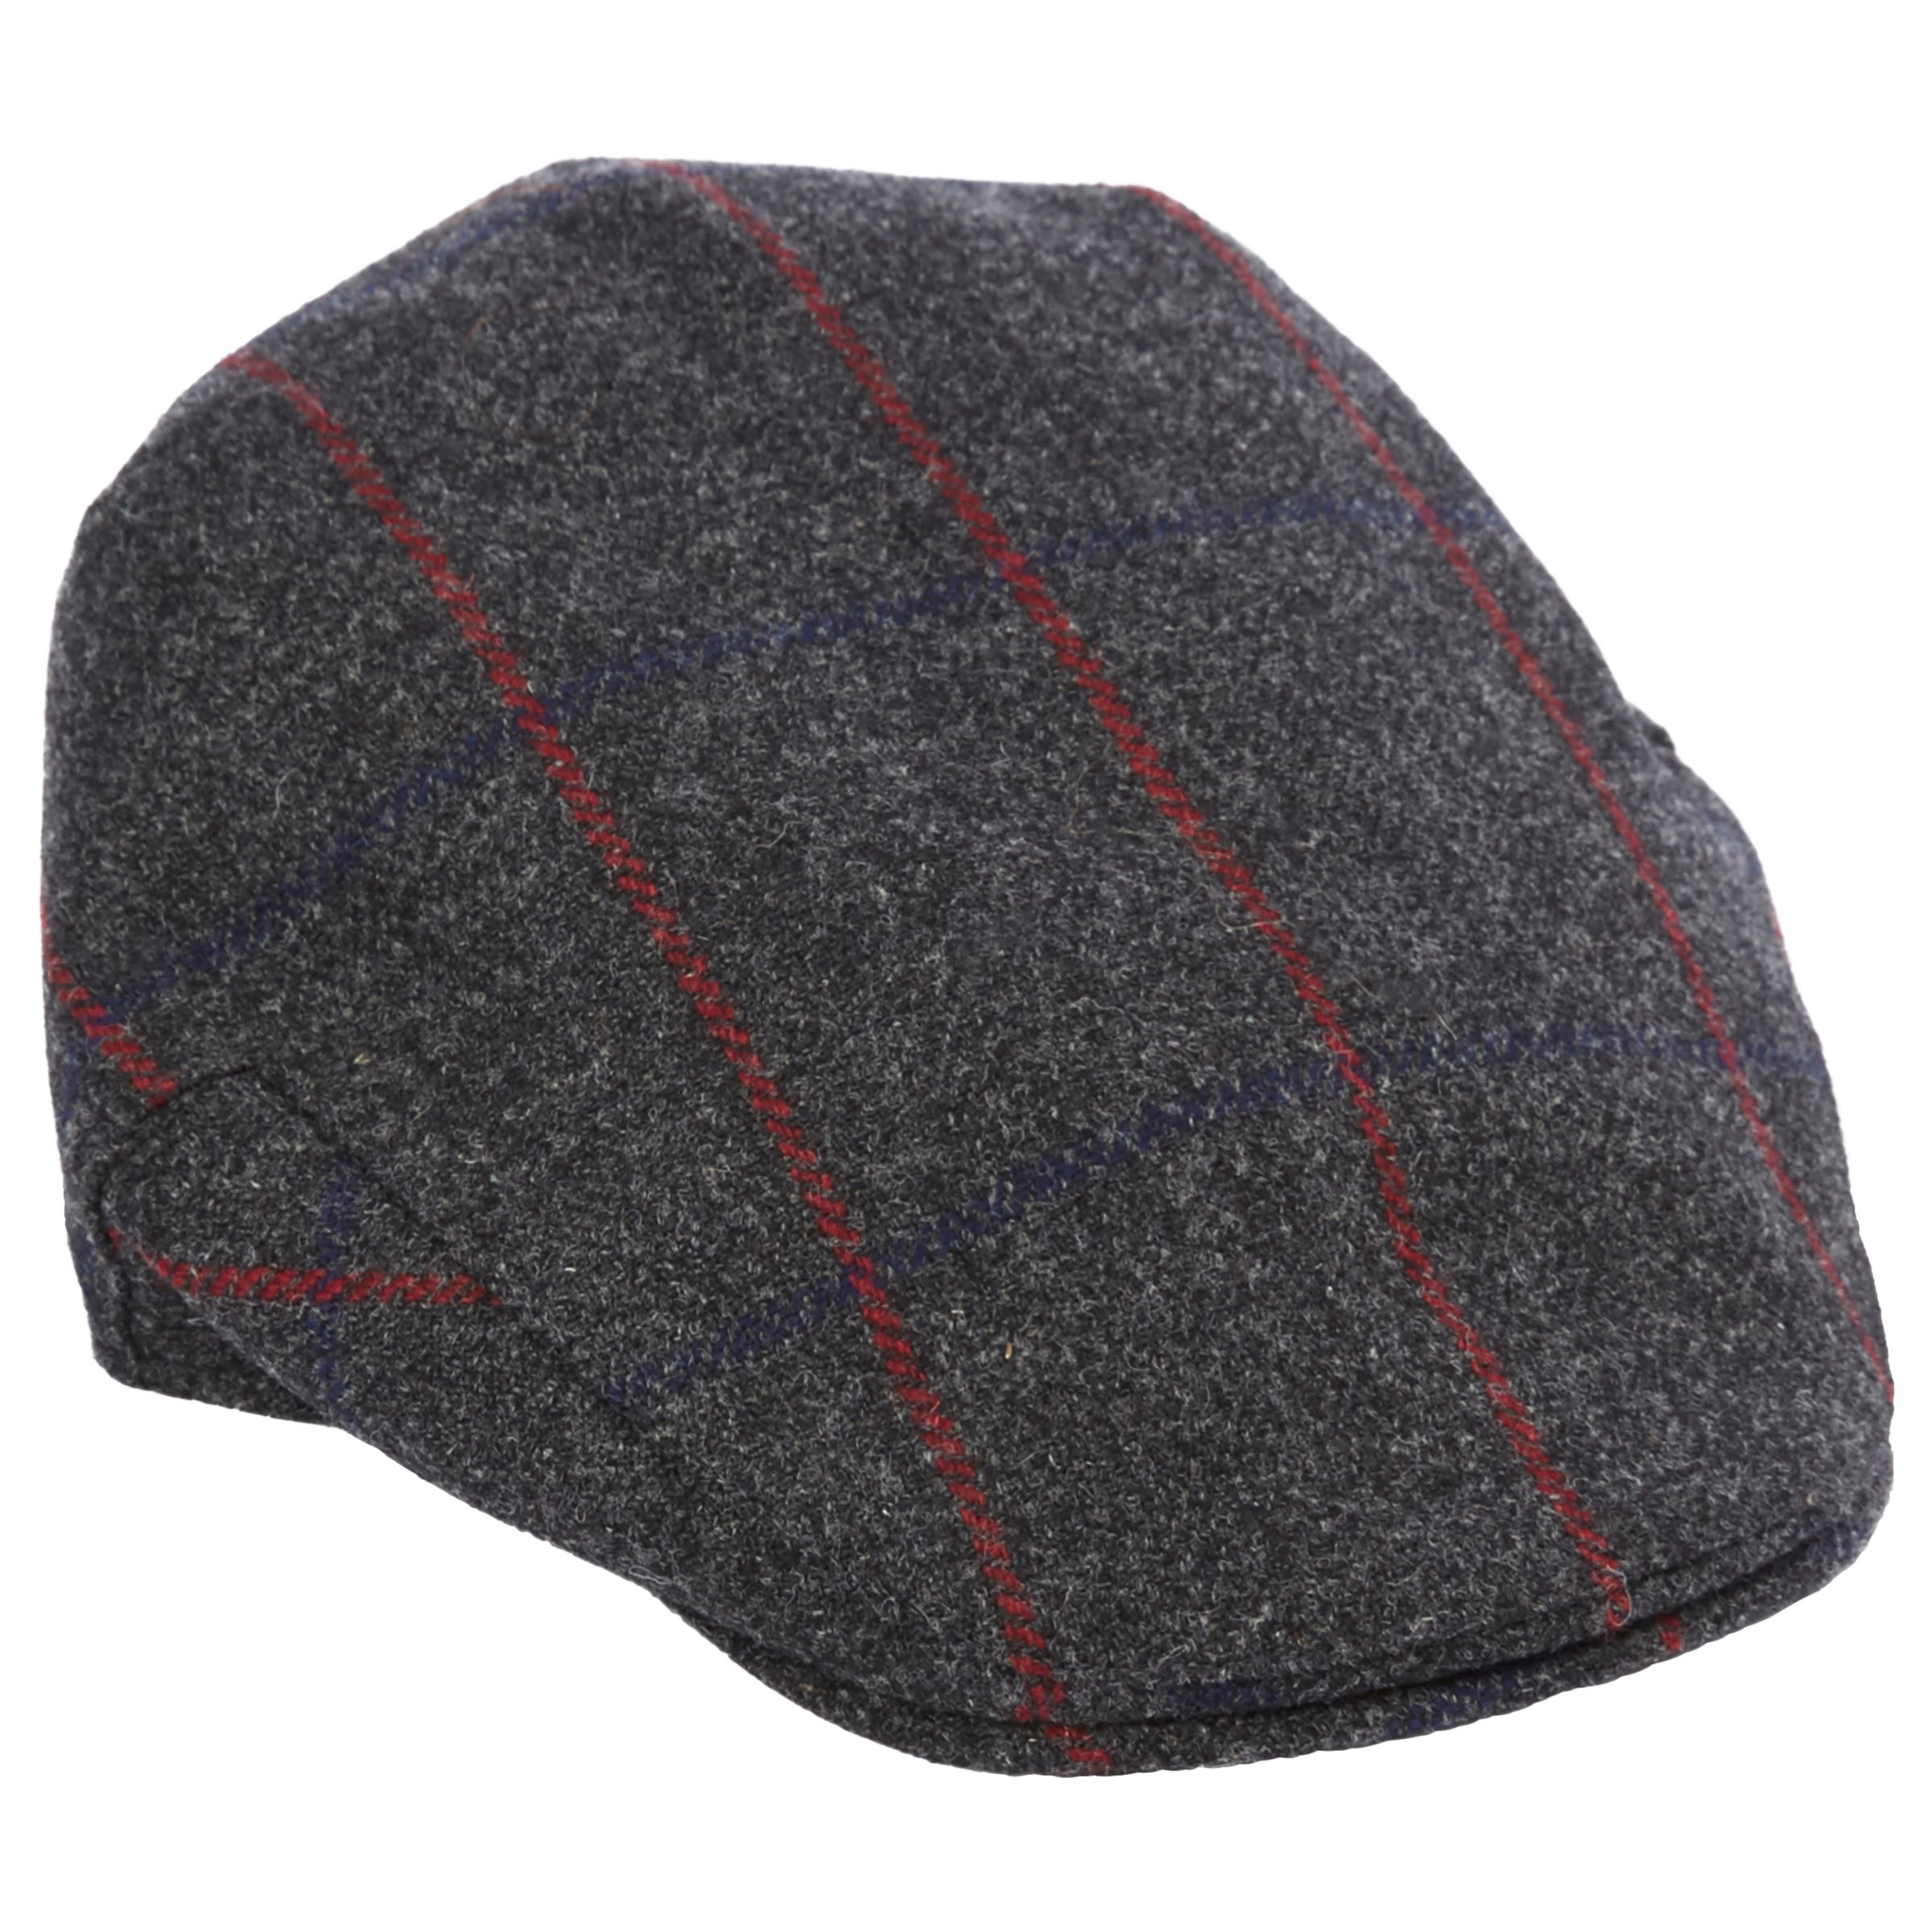 759ab374e Christys' Balmoral Wool Tweed Flat Cap, Charcoal/Red at John Lewis ...